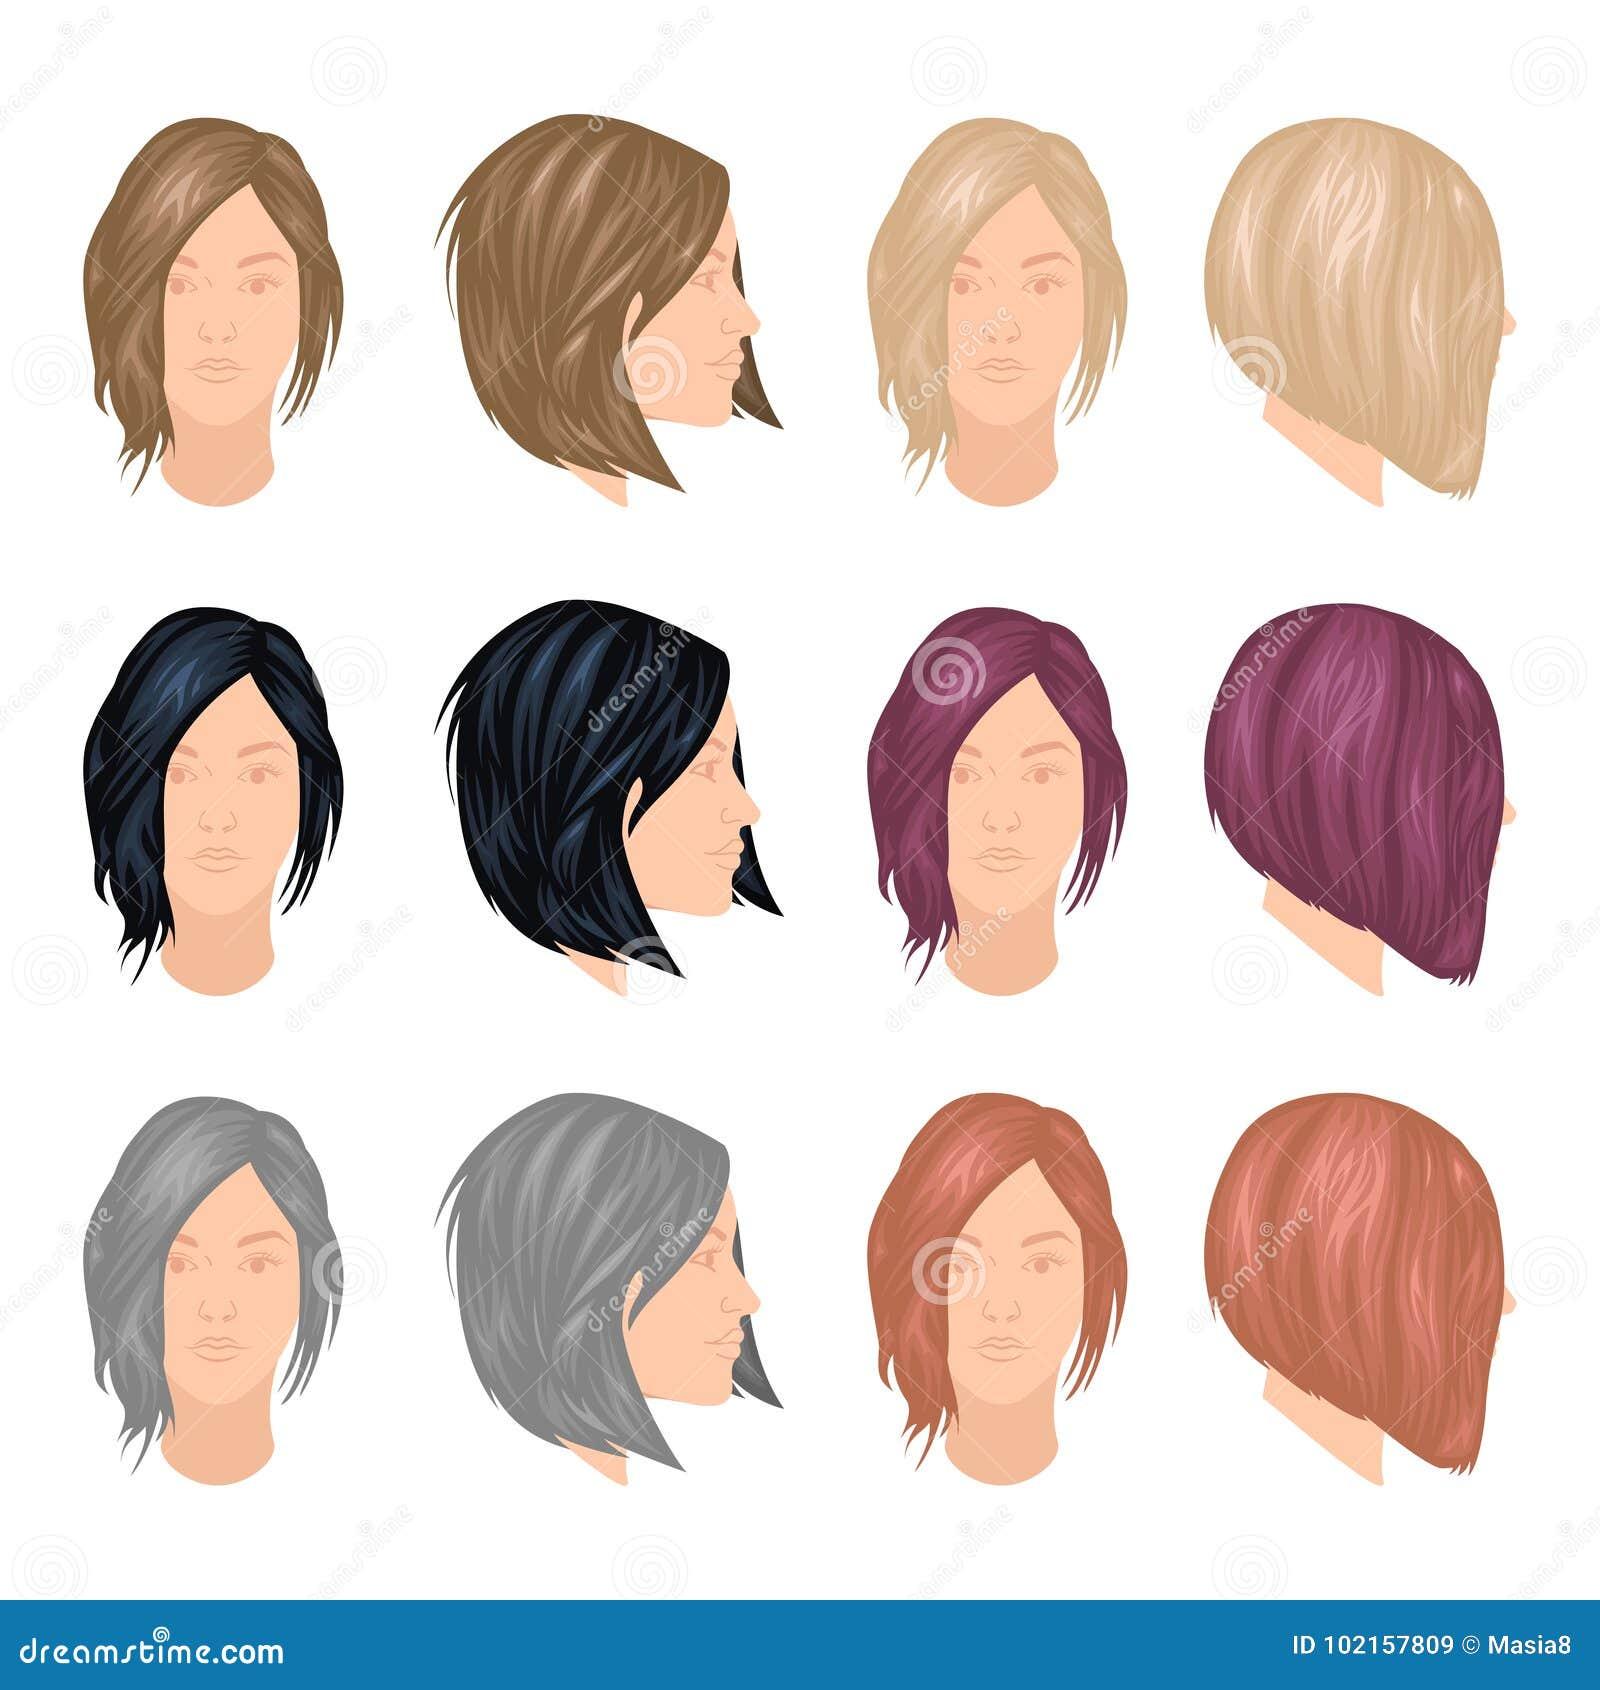 trendy woman hairstyles stock illustration illustration of gray